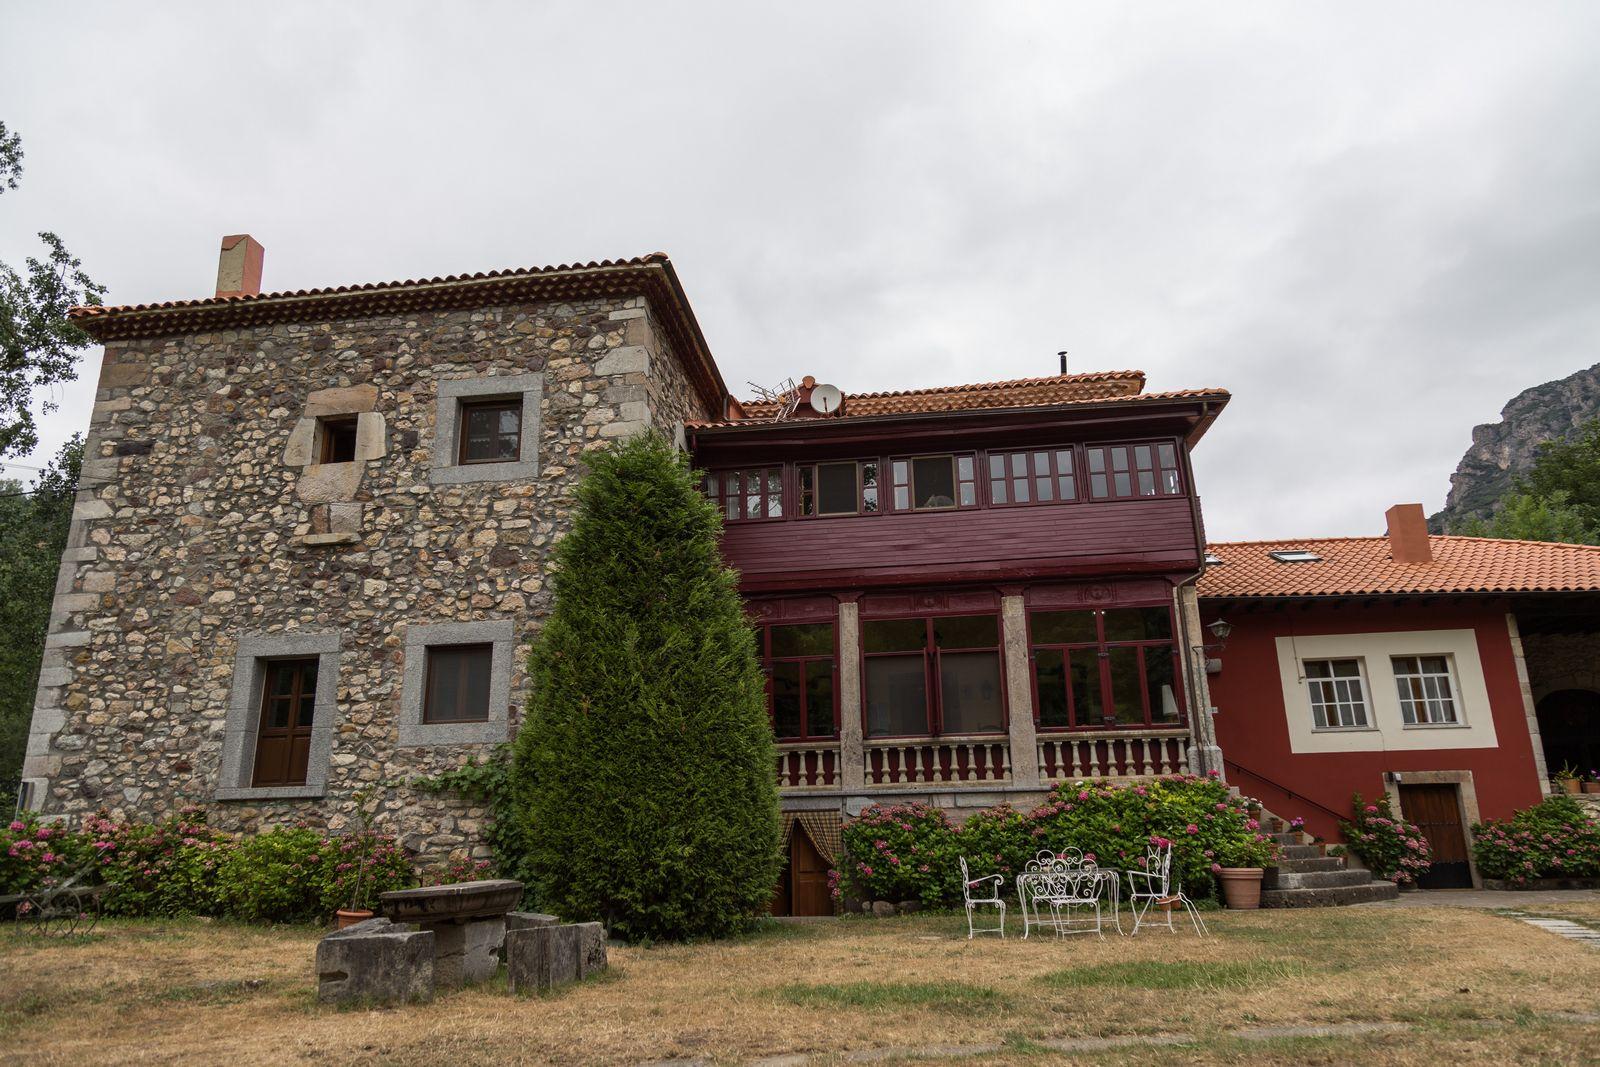 Exteriores del Palacio (I)